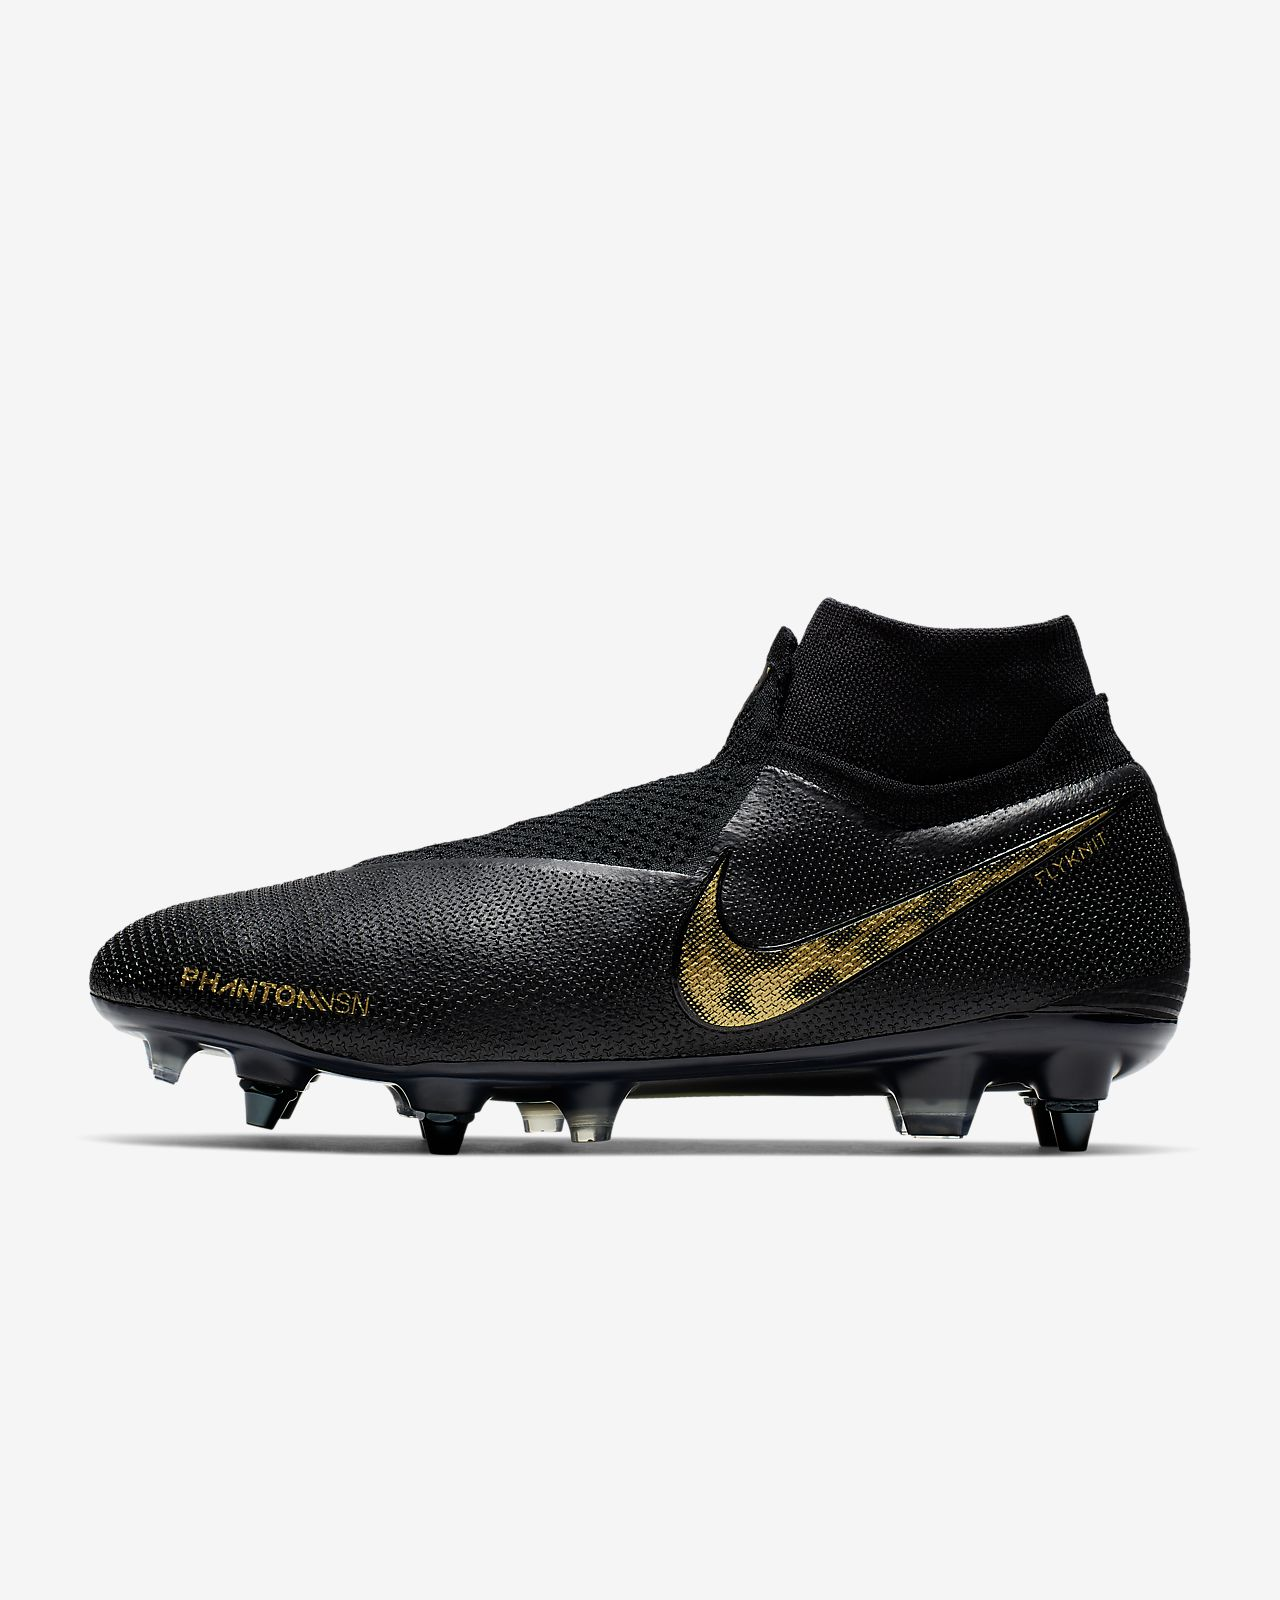 brand new a4813 e9f79 ... Nike Phantom Vision Elite Dynamic Fit Anti-Clog SG-PRO Voetbalschoen